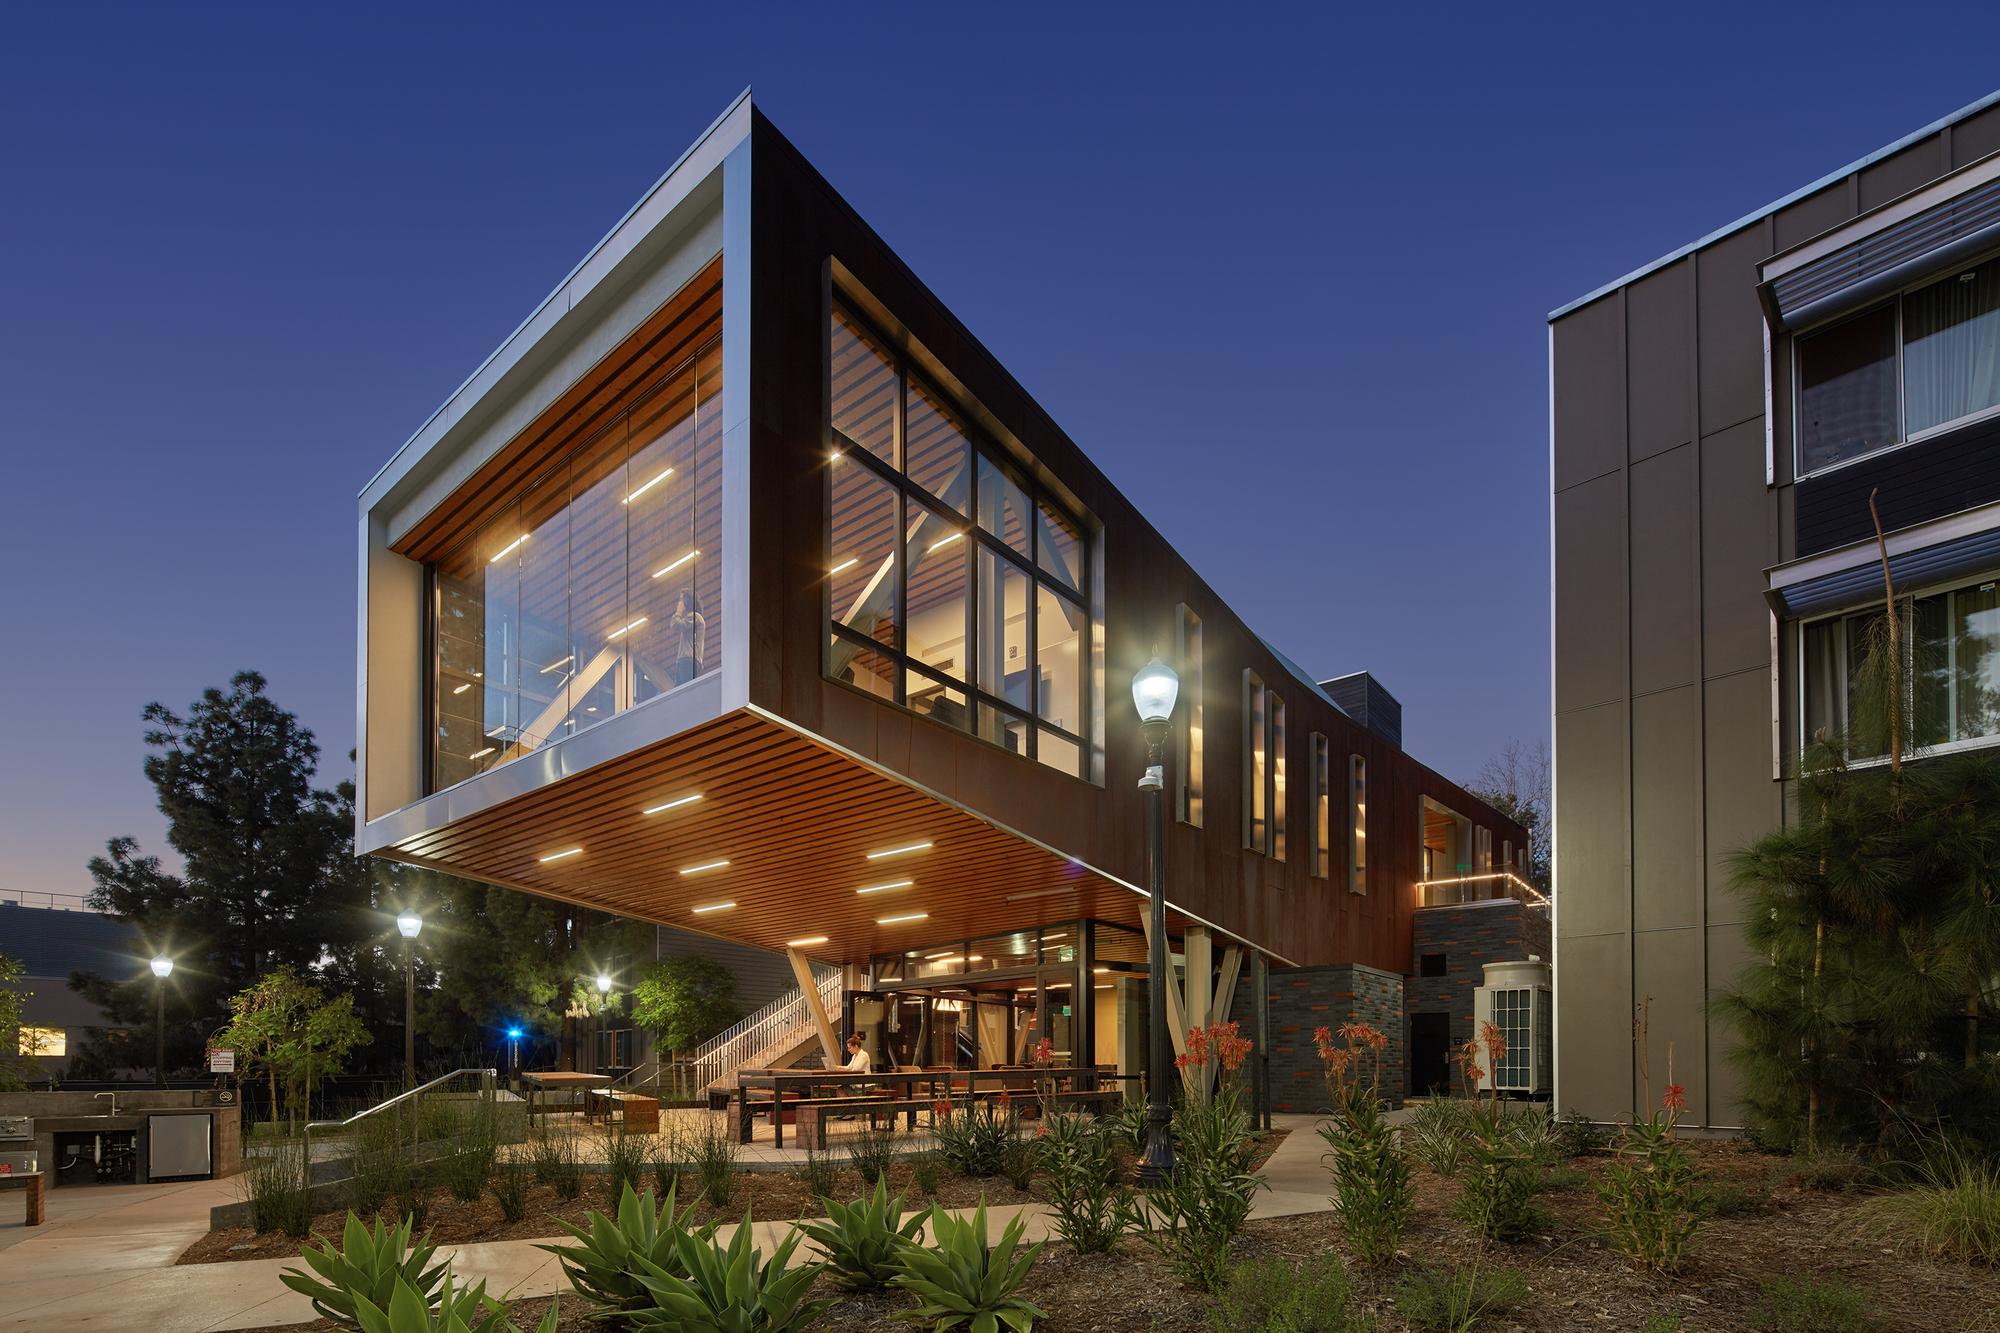 hight resolution of ucla saxon suites studio e architects